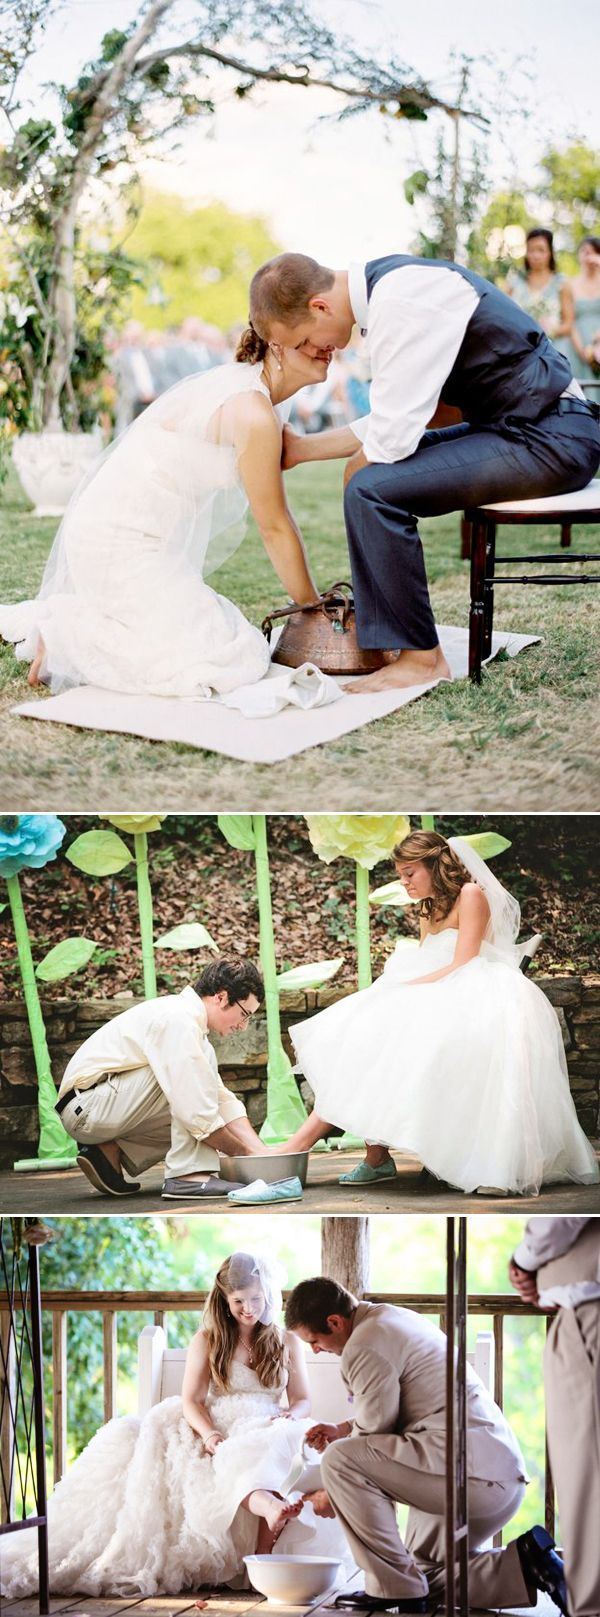 Washing each other's feet instead of tossing a bouquet/garter.